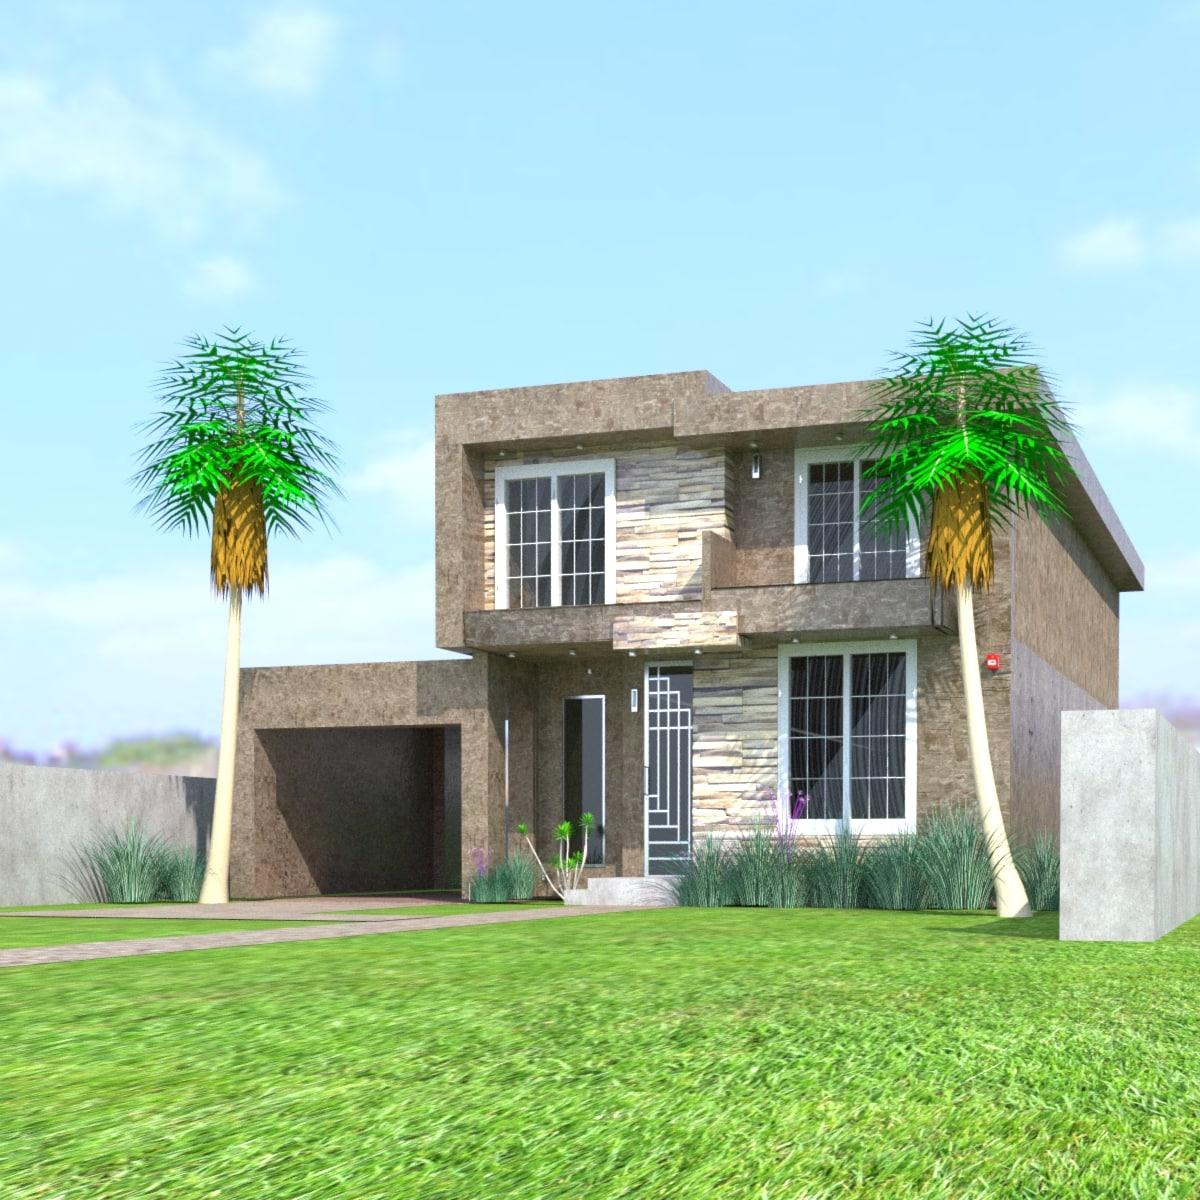 3D designed house